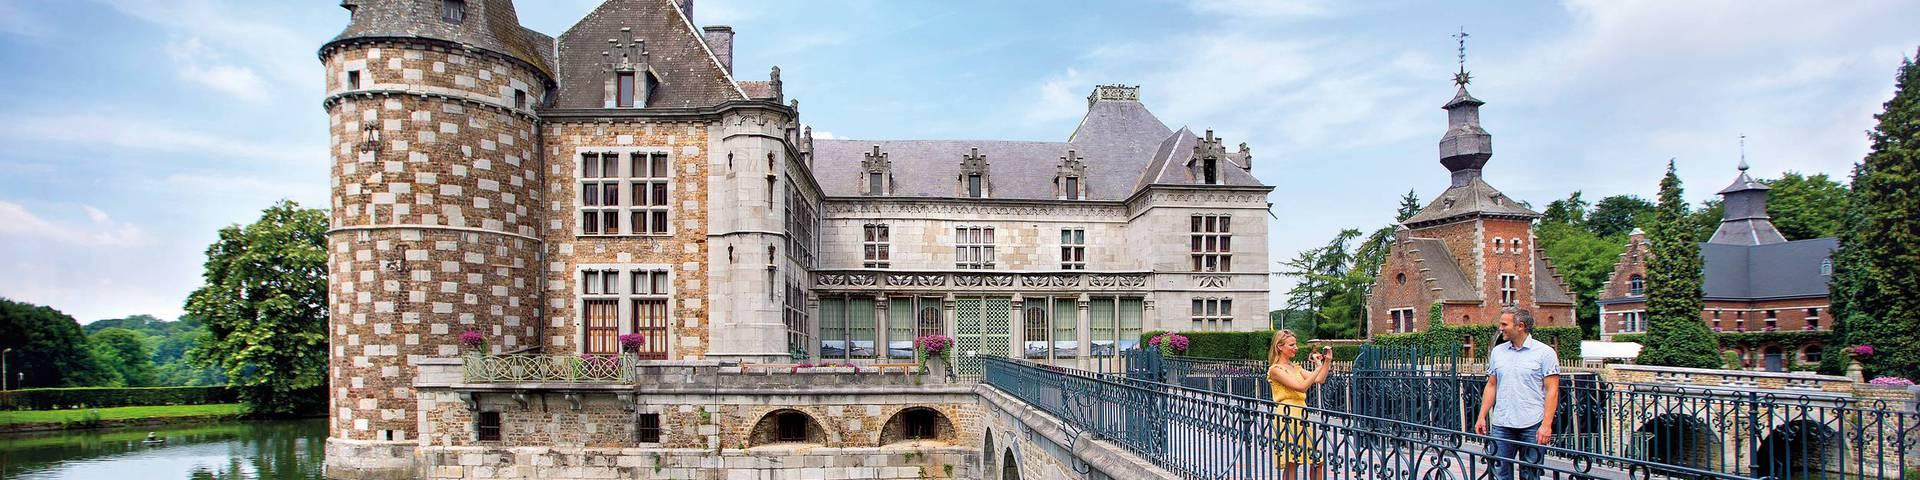 Château de Jehay - Copyright David Samyn